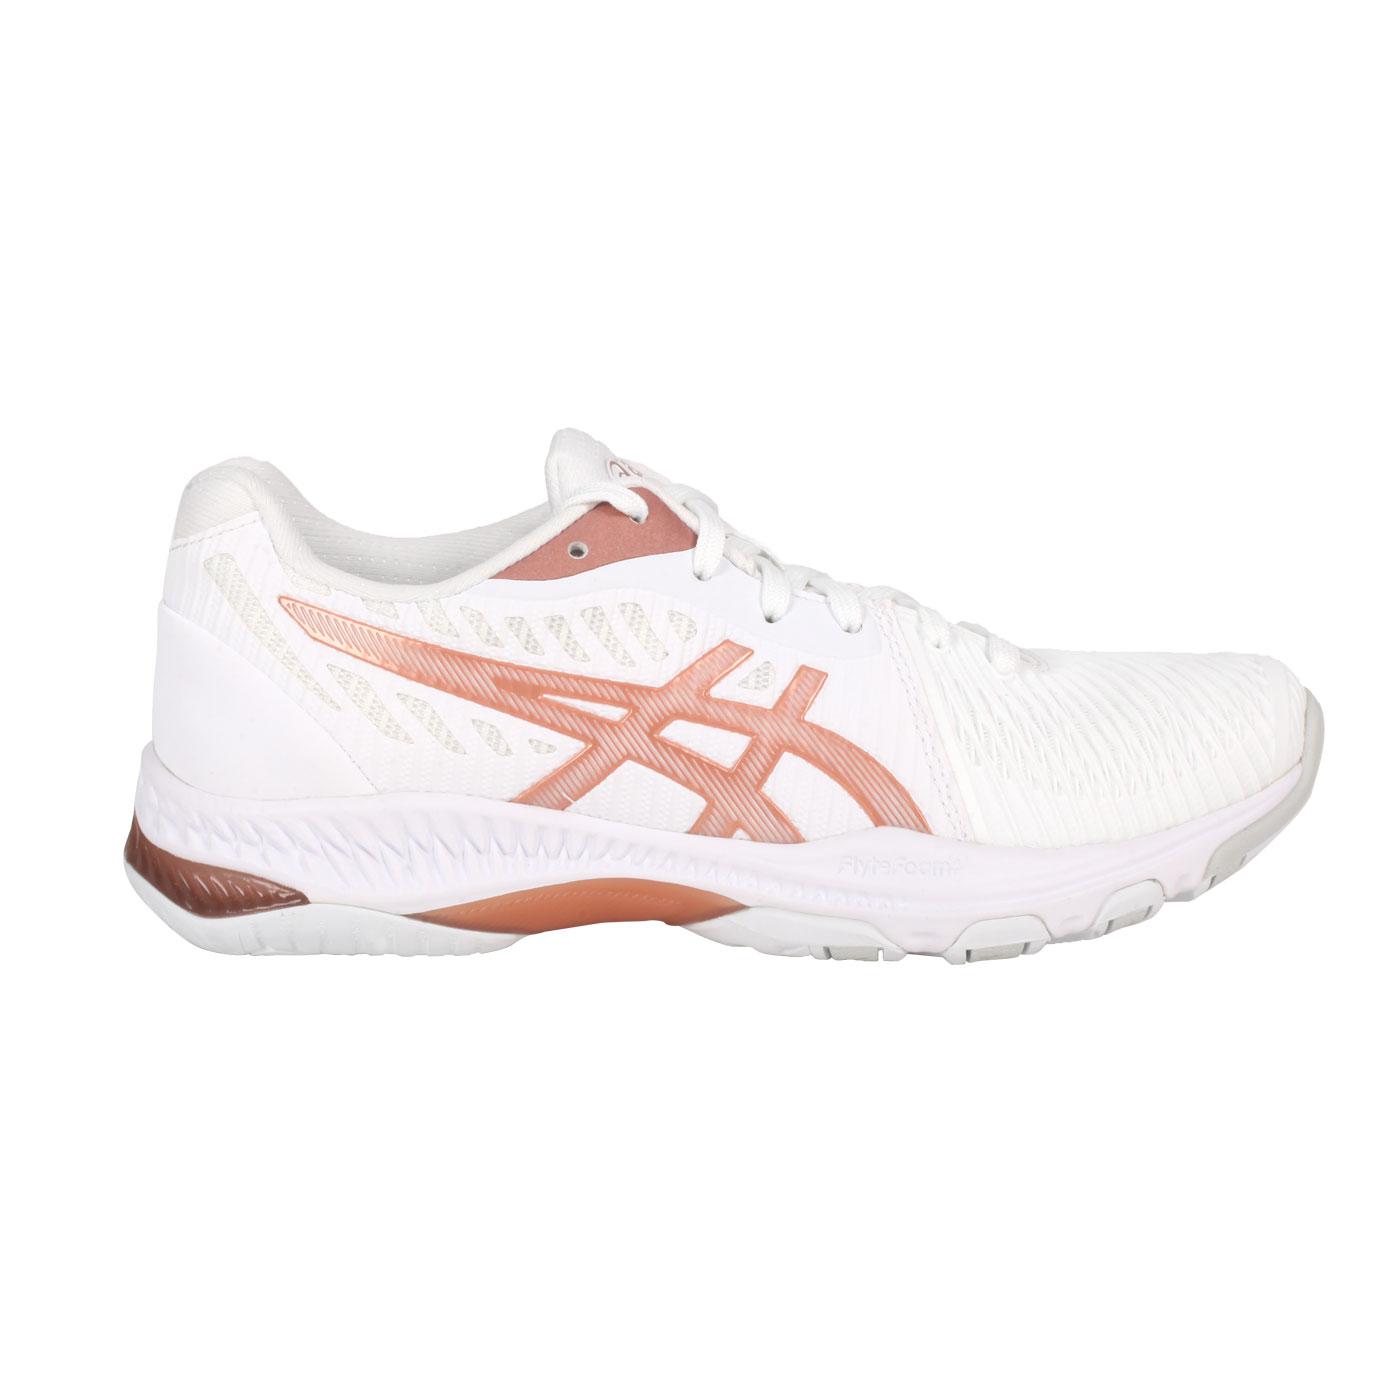 ASICS 男女款排球鞋  @NETBURNER BALLISTIC FF 2@1052A033-102 - 白玫瑰金